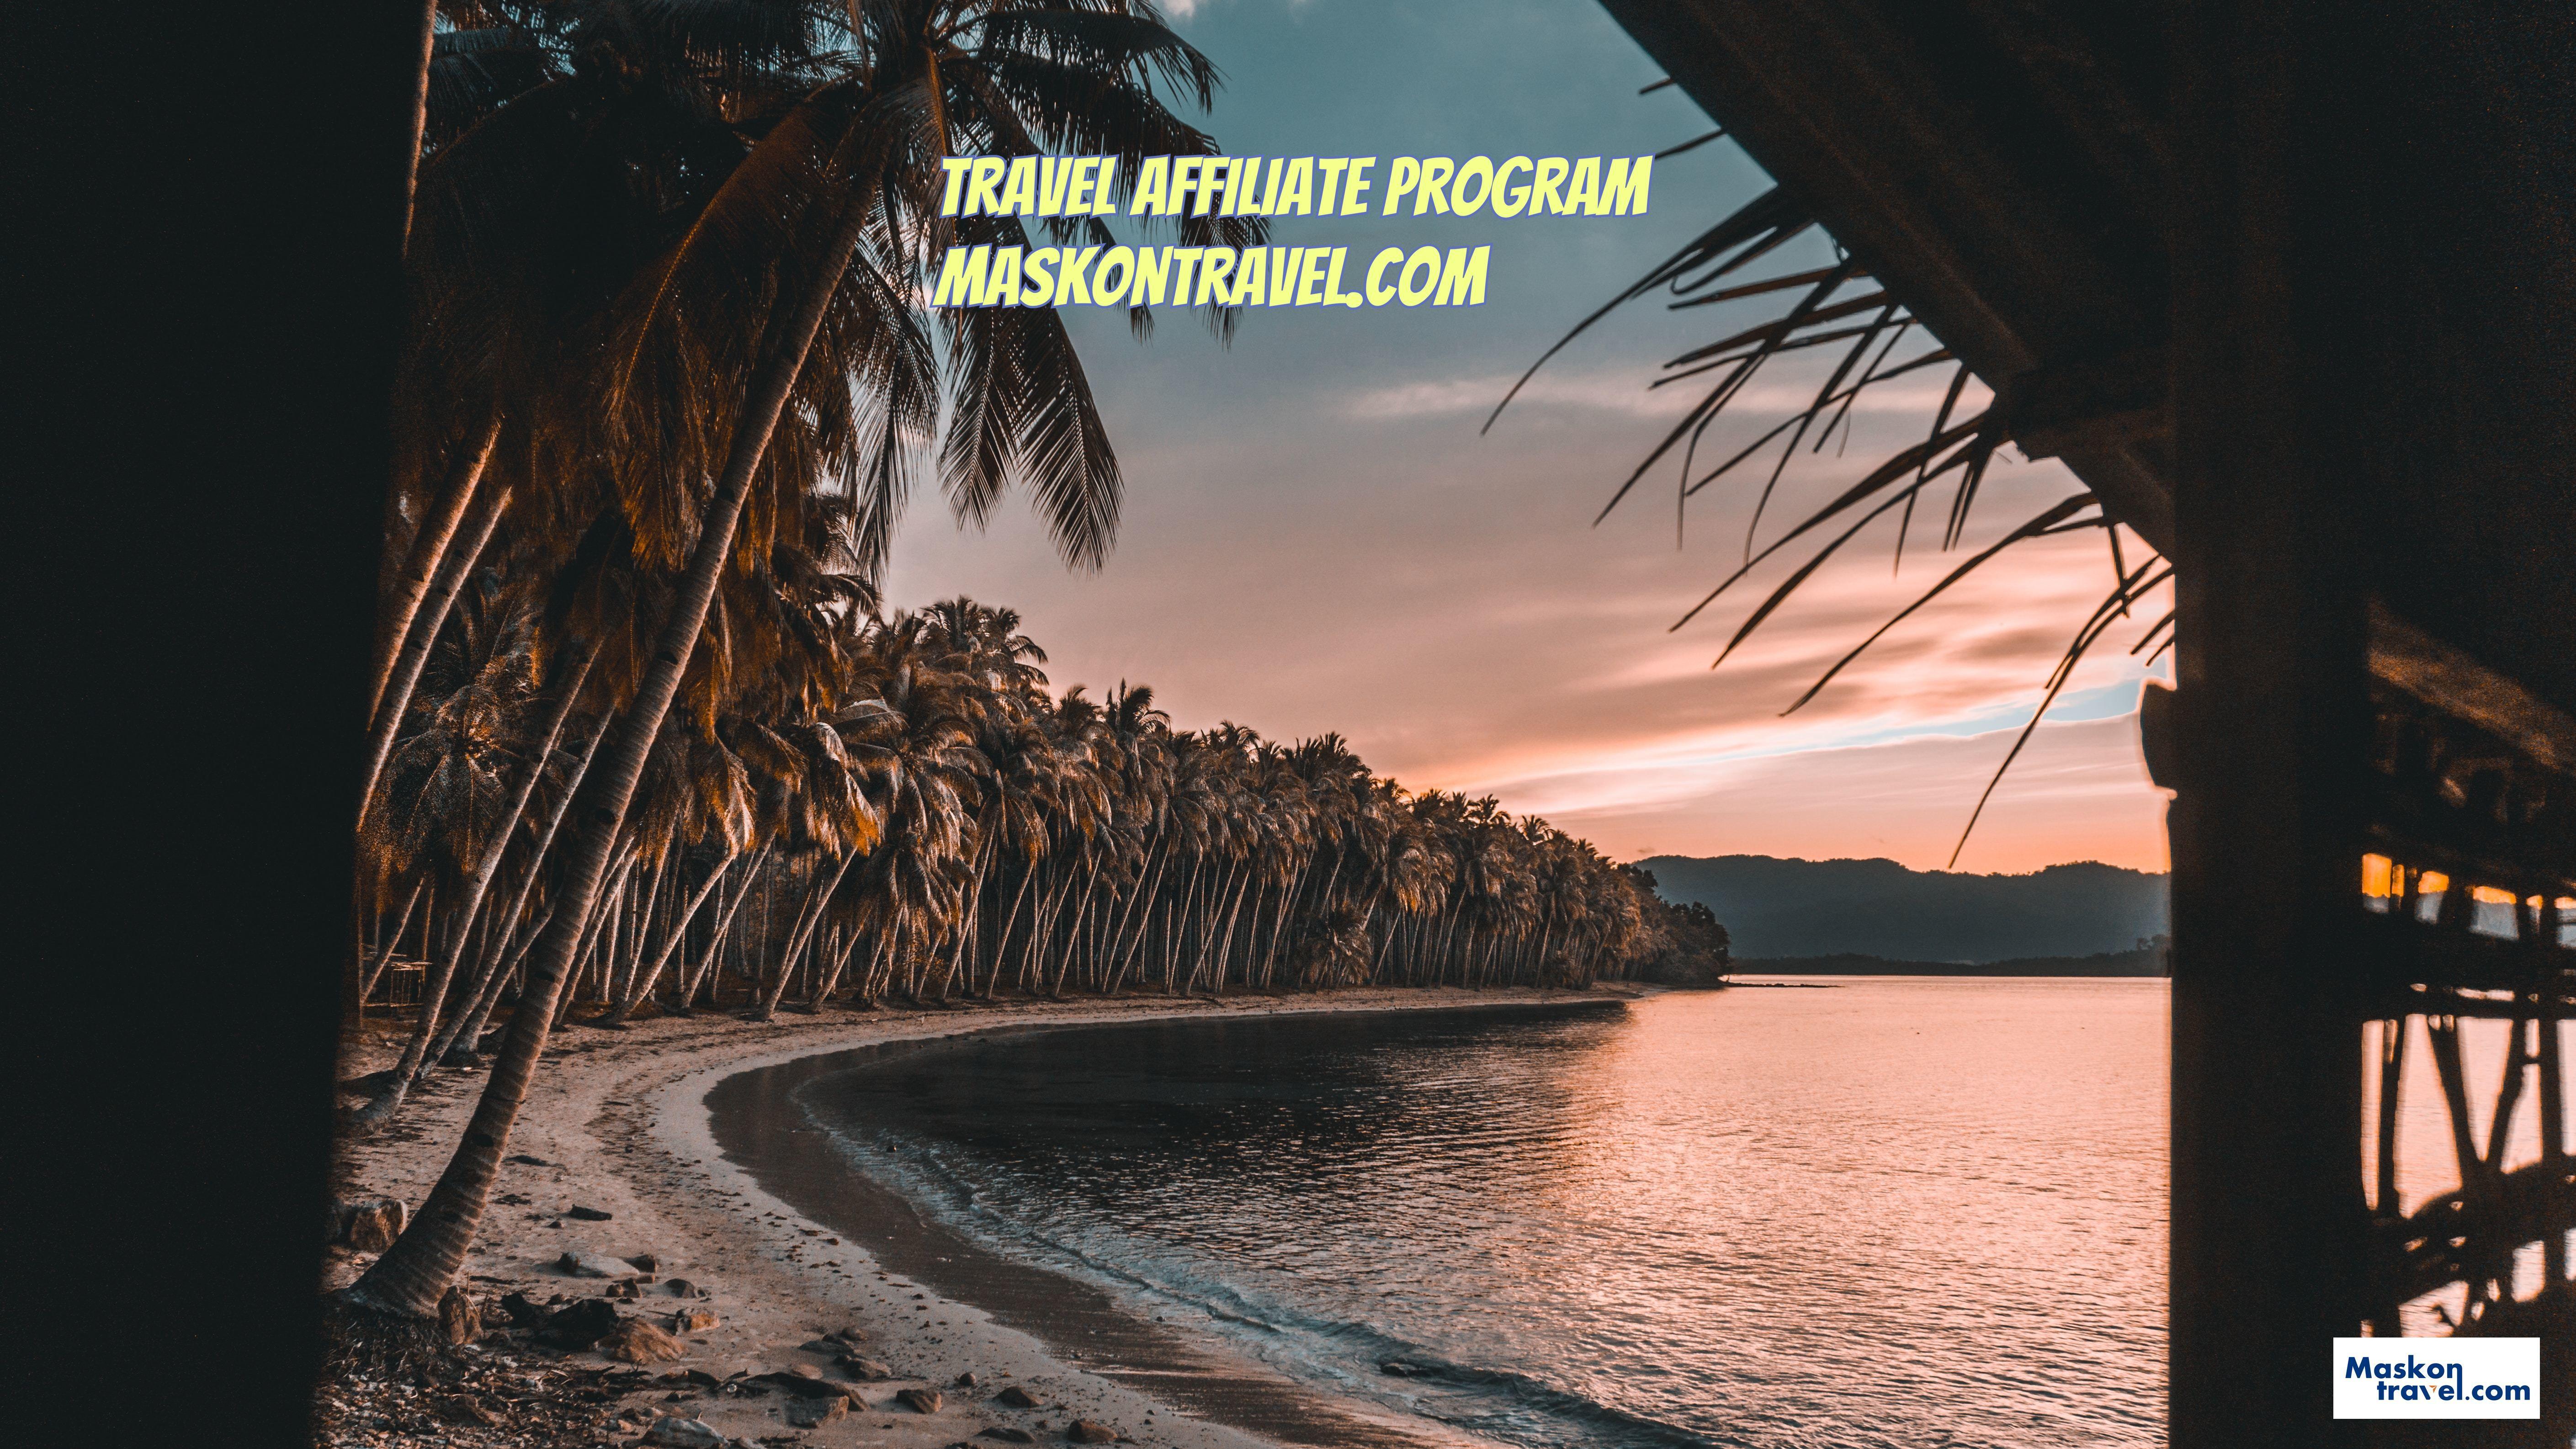 travelaffiliateprogram travel affiliate program